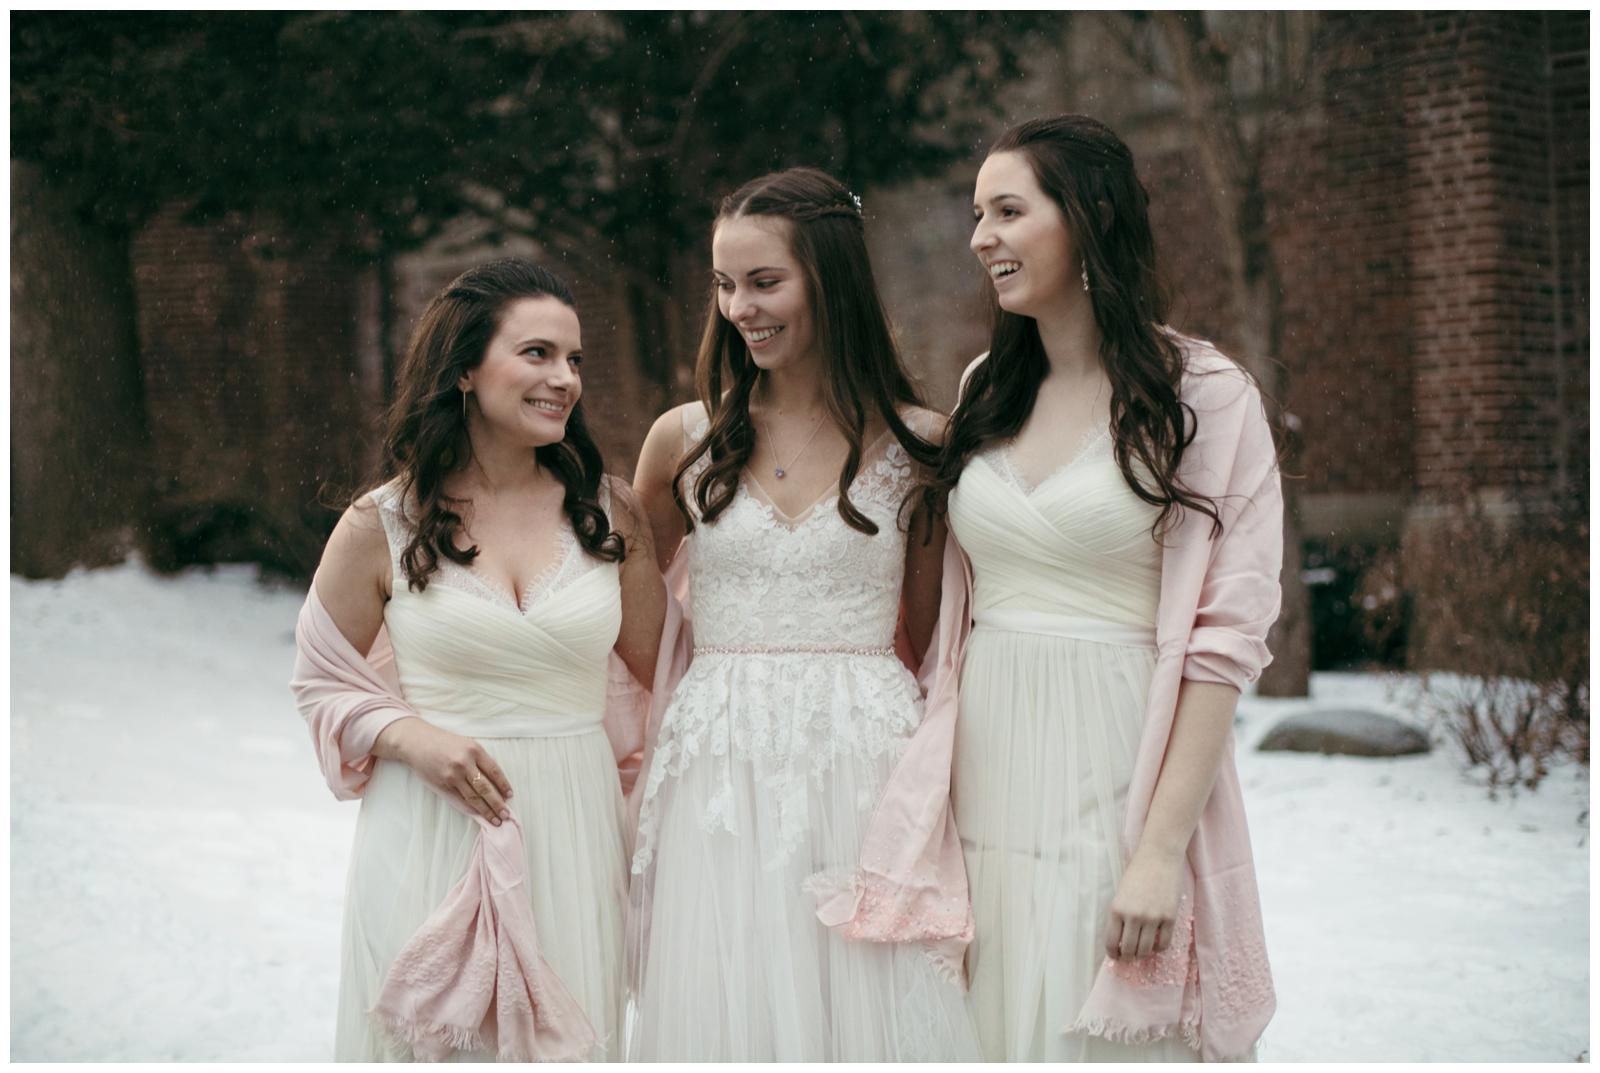 Alden-Castle-Wedding-Boston-Bailey-Q-Photo-004.jpg